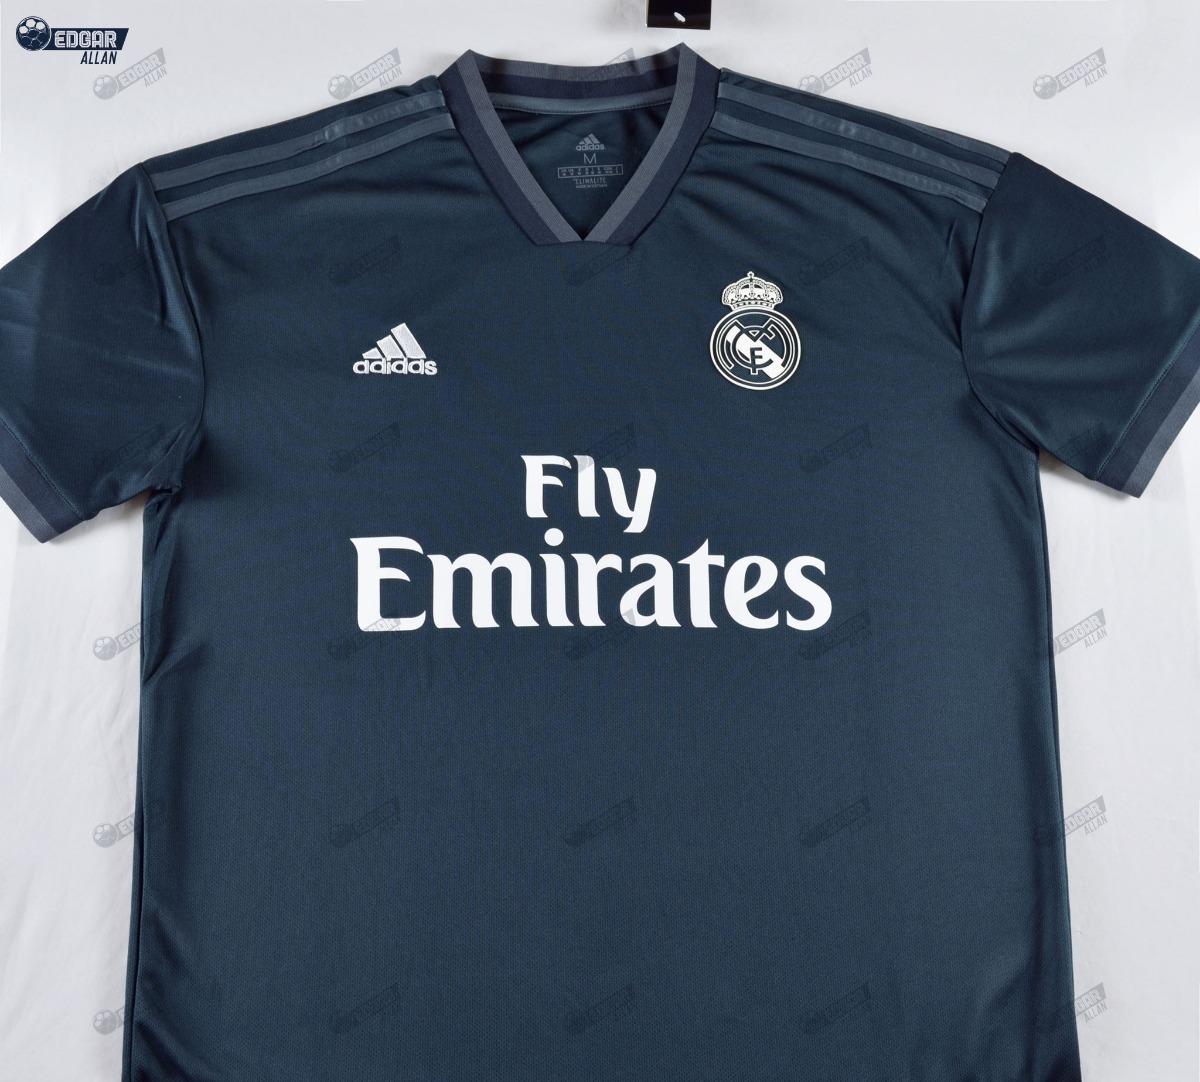 Real Modric Kroos Madrid Cargando Zoom Original Camiseta Isco Nueva 2018  q7vZanx b522428f85fcb